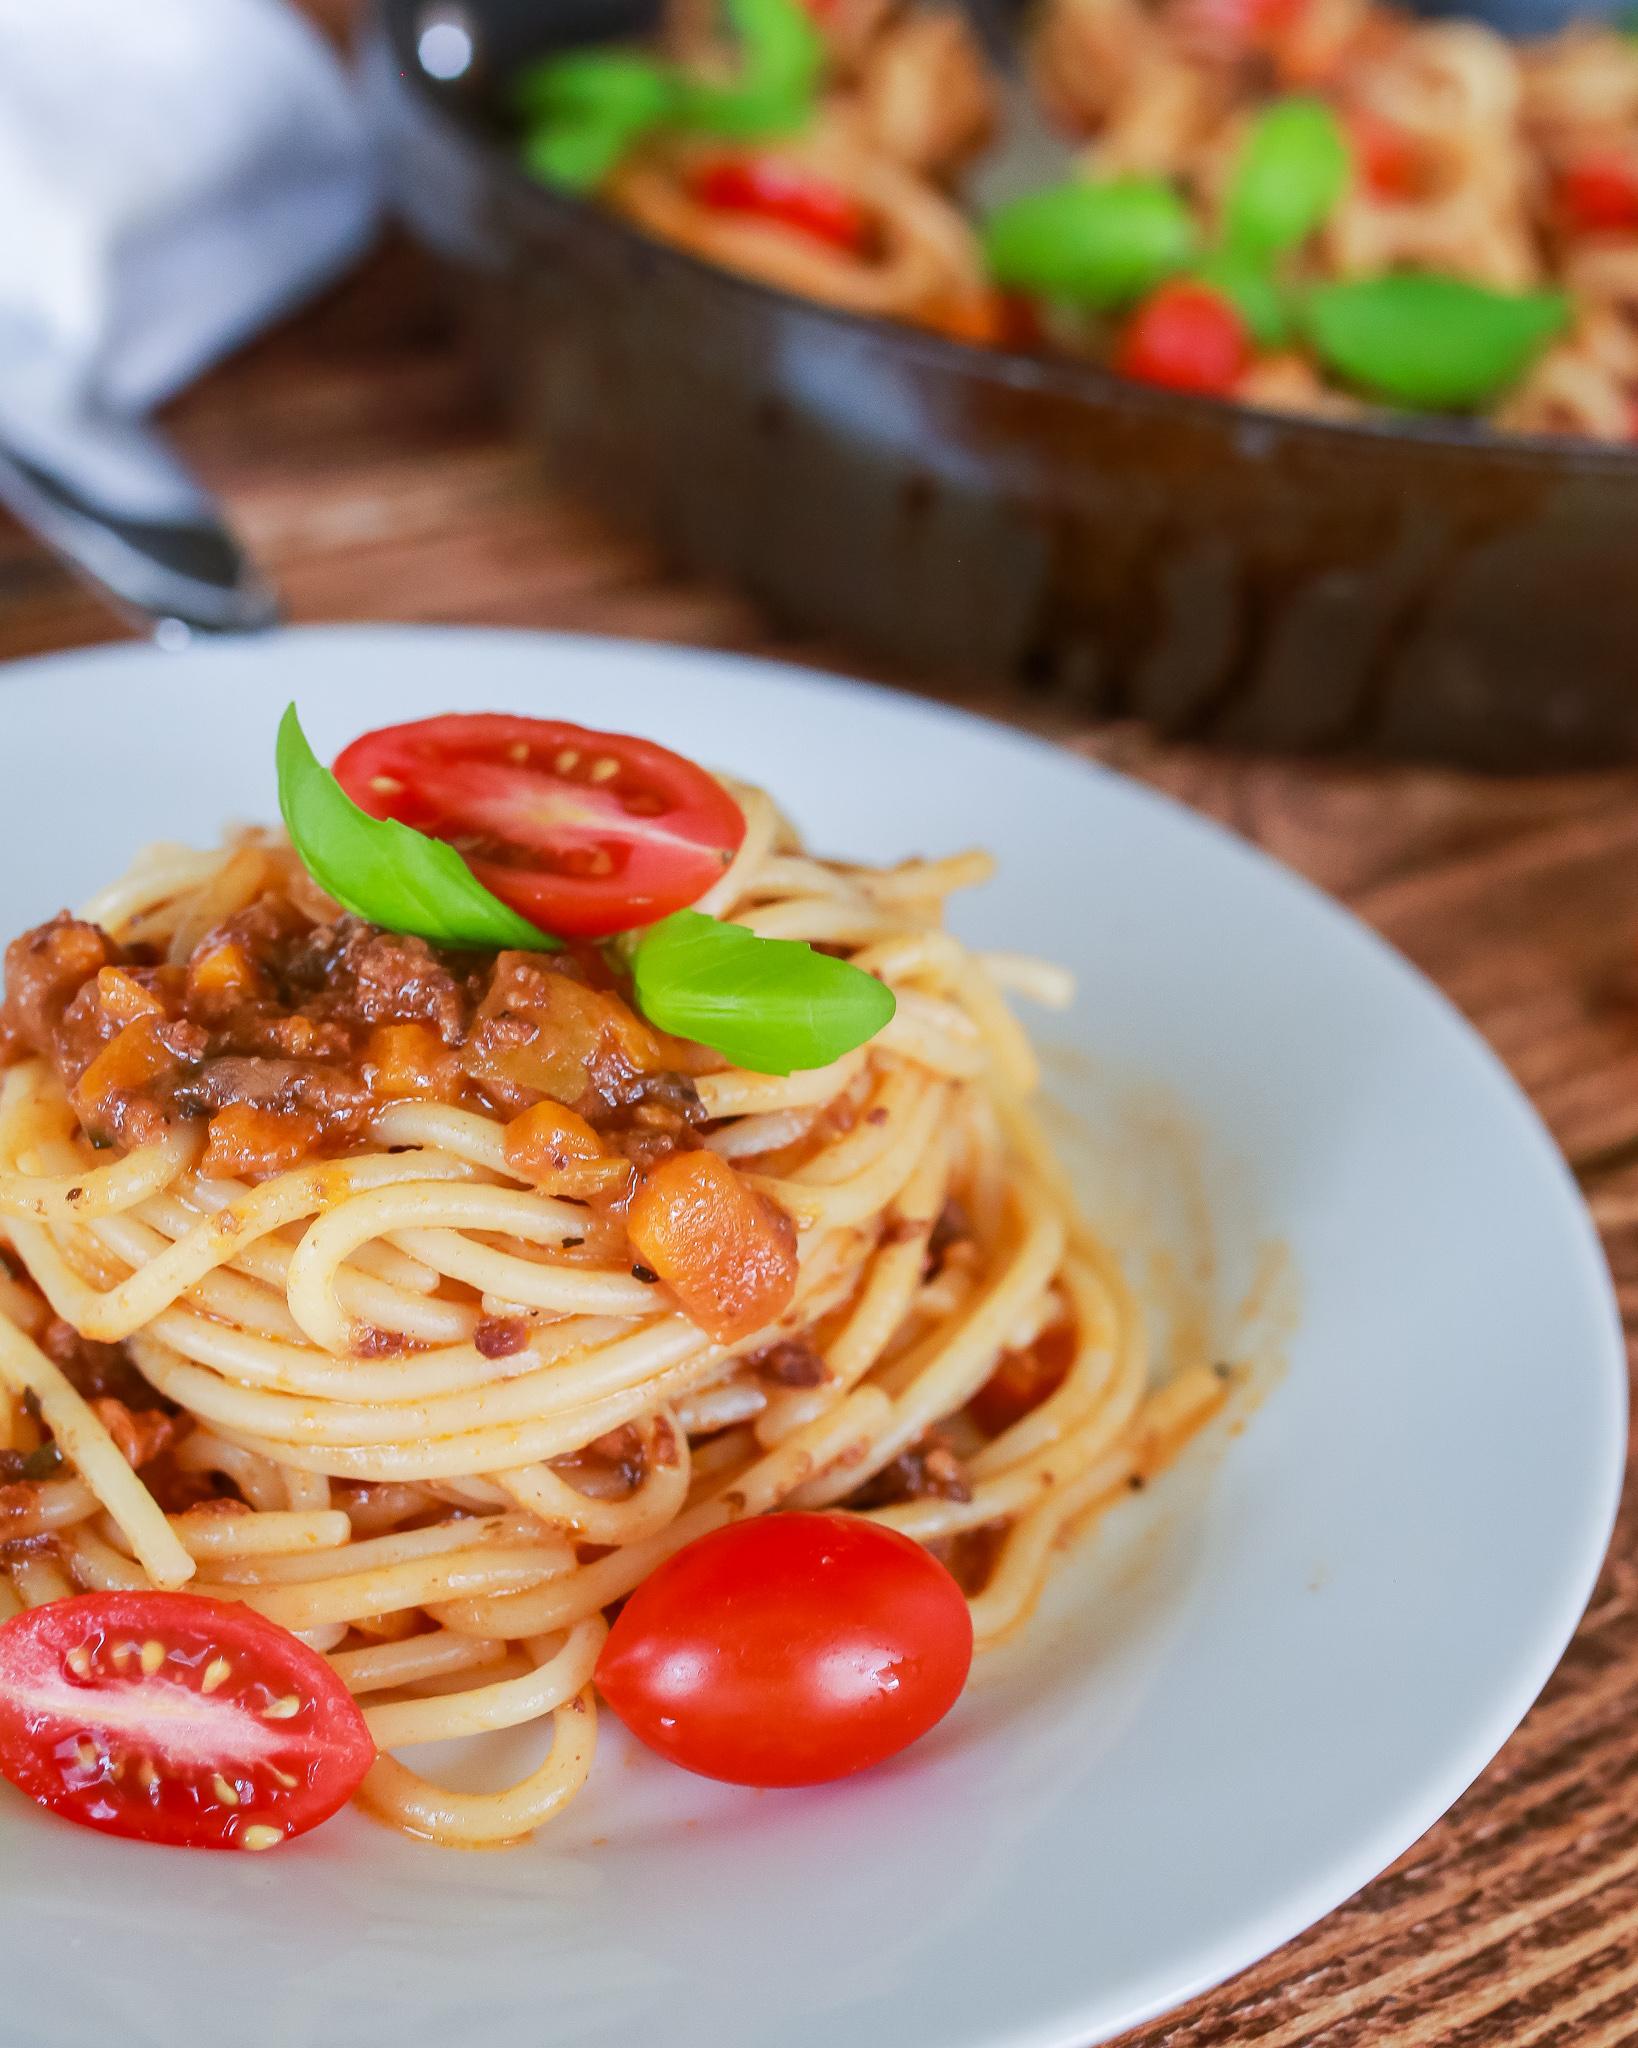 Homemade Italian meat sauce recipe with veggies in it!